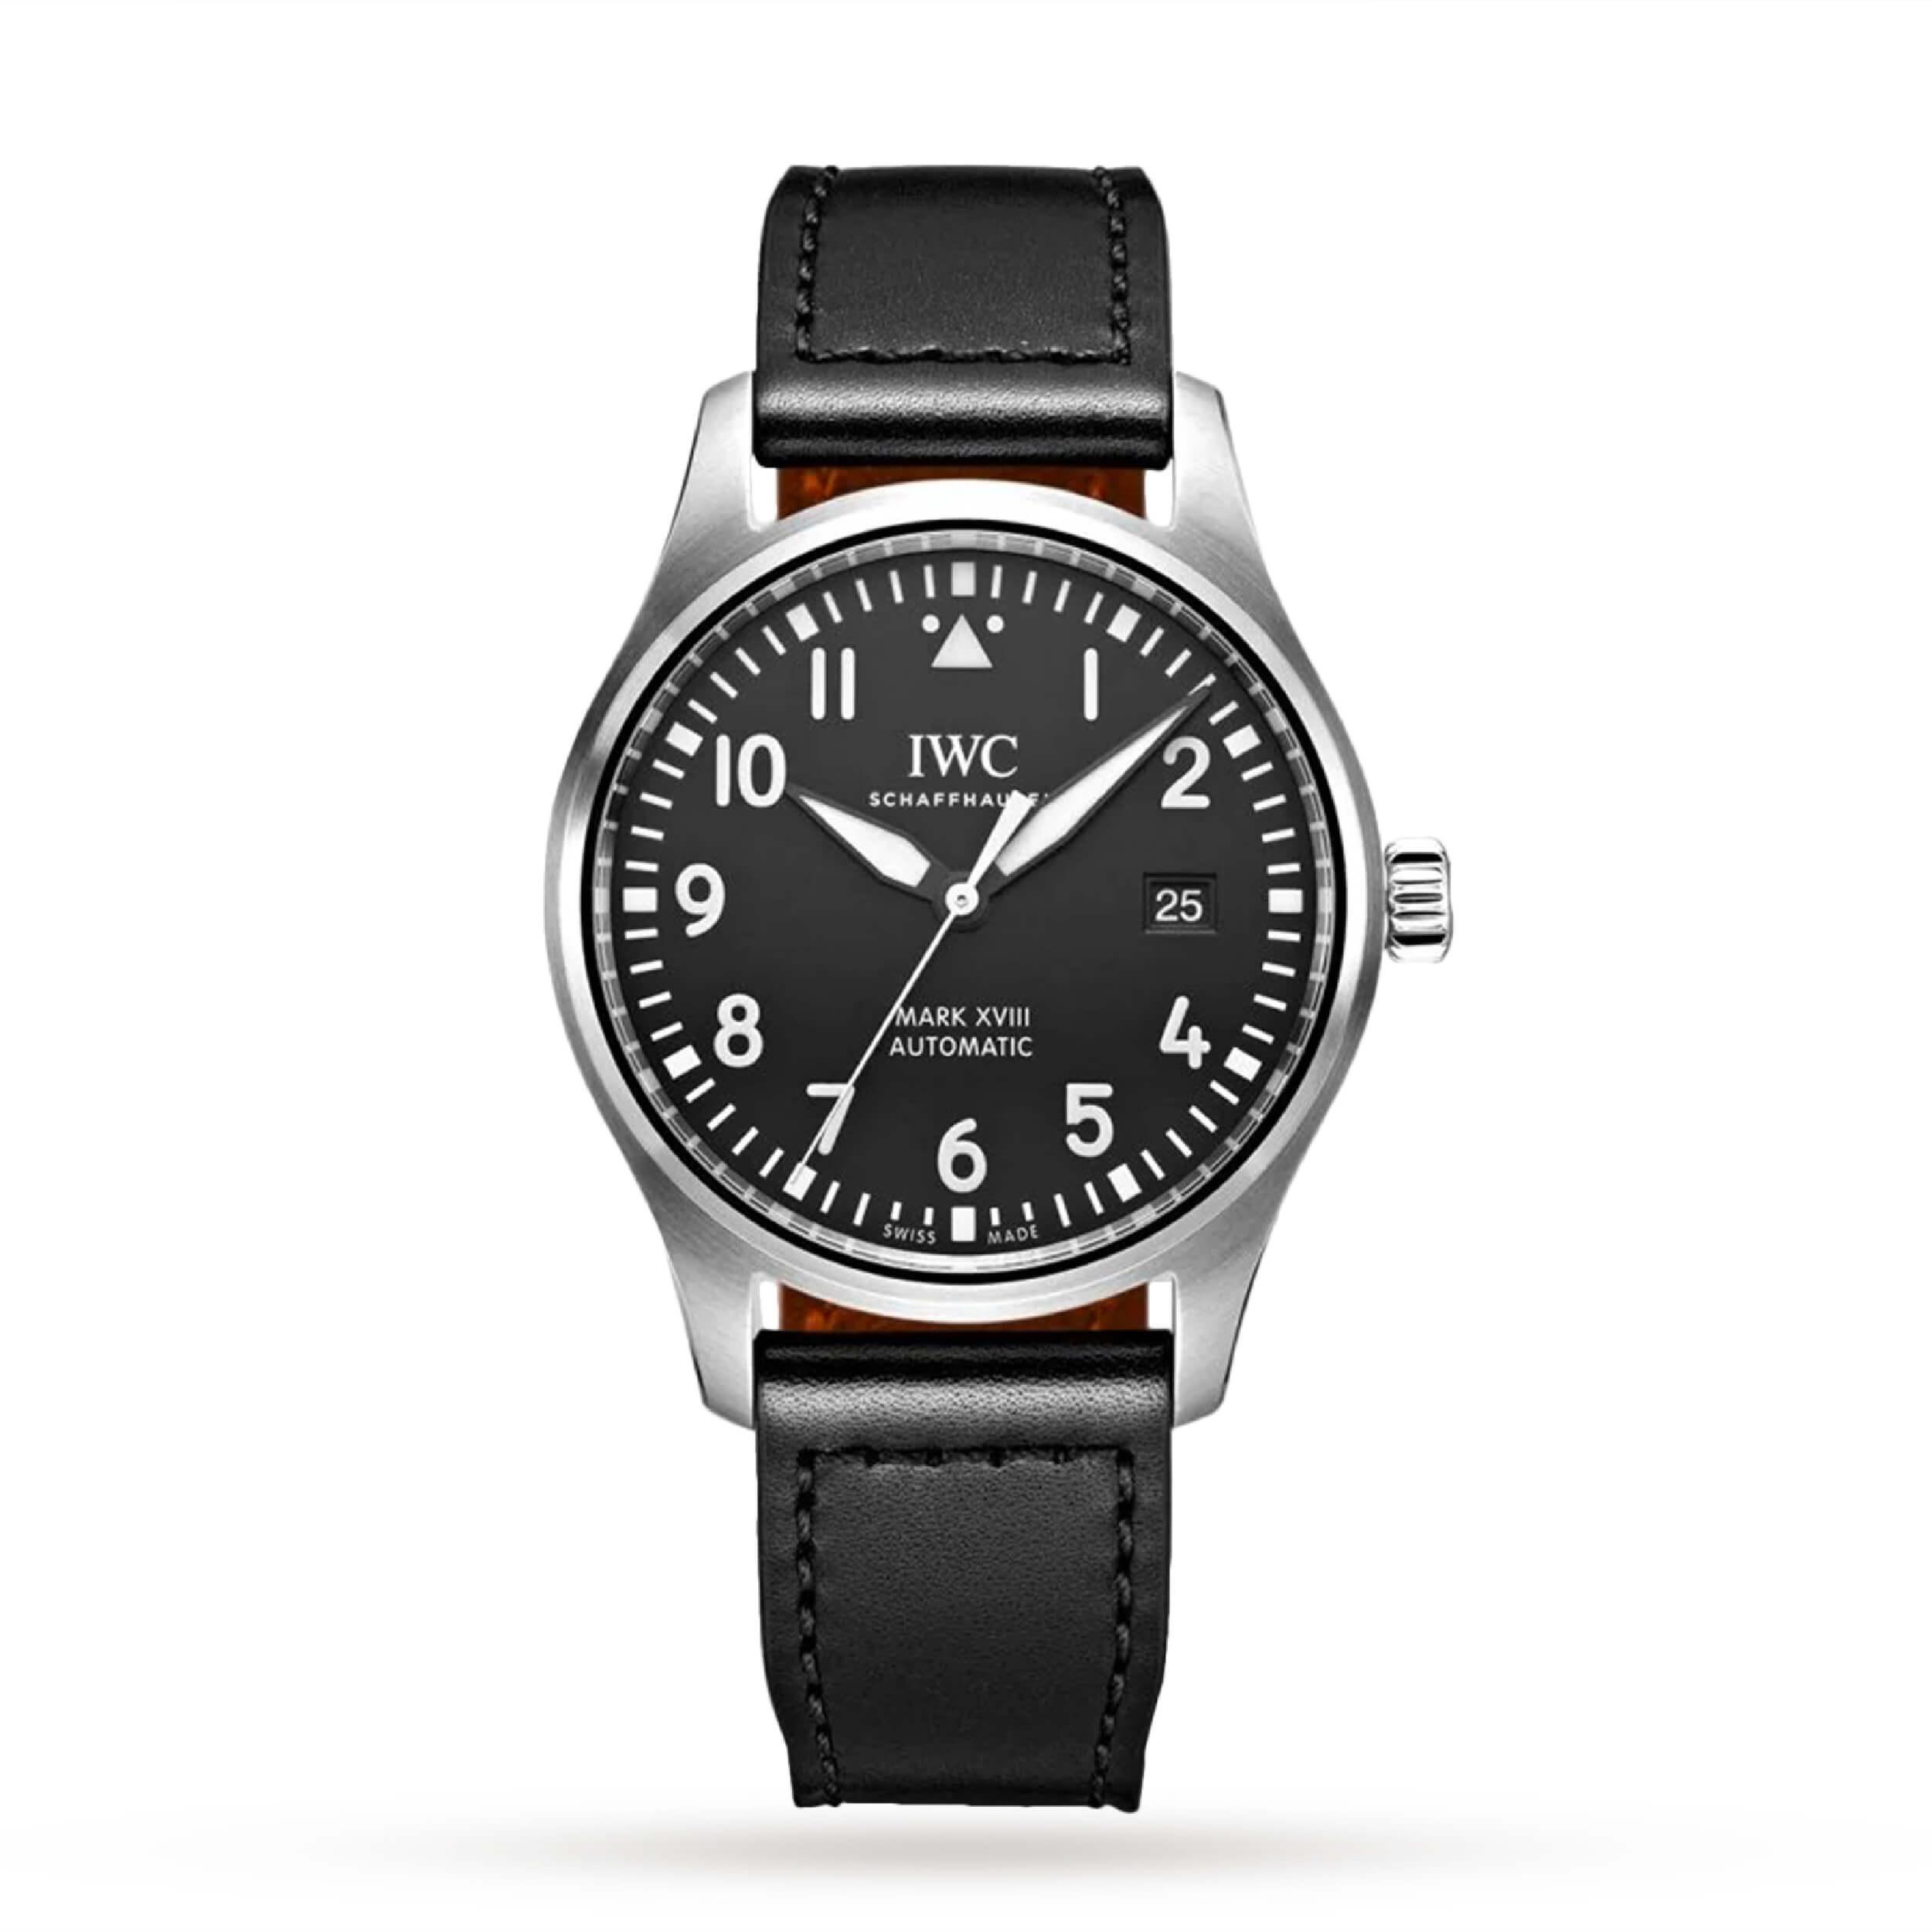 IWC Pilot's Mark XVIII | 5 Iconic Luxury Pilot Watches